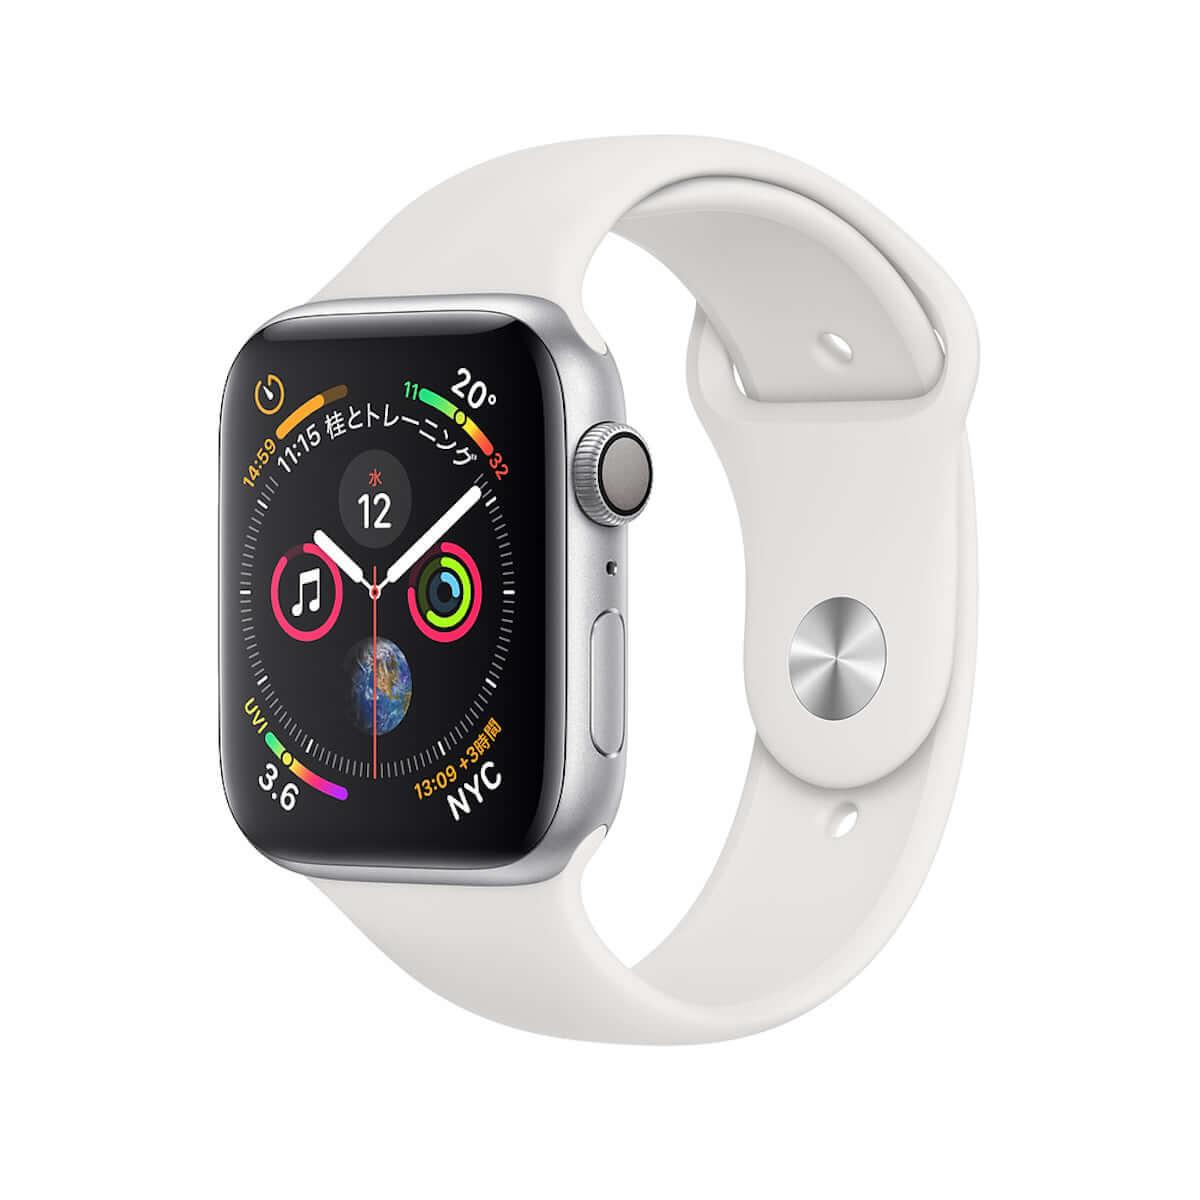 Apple Watchが今度はヨーロッパで命を救った!心電図機能導入後わずか1週間 tech190404_applewatch_main-1200x1200